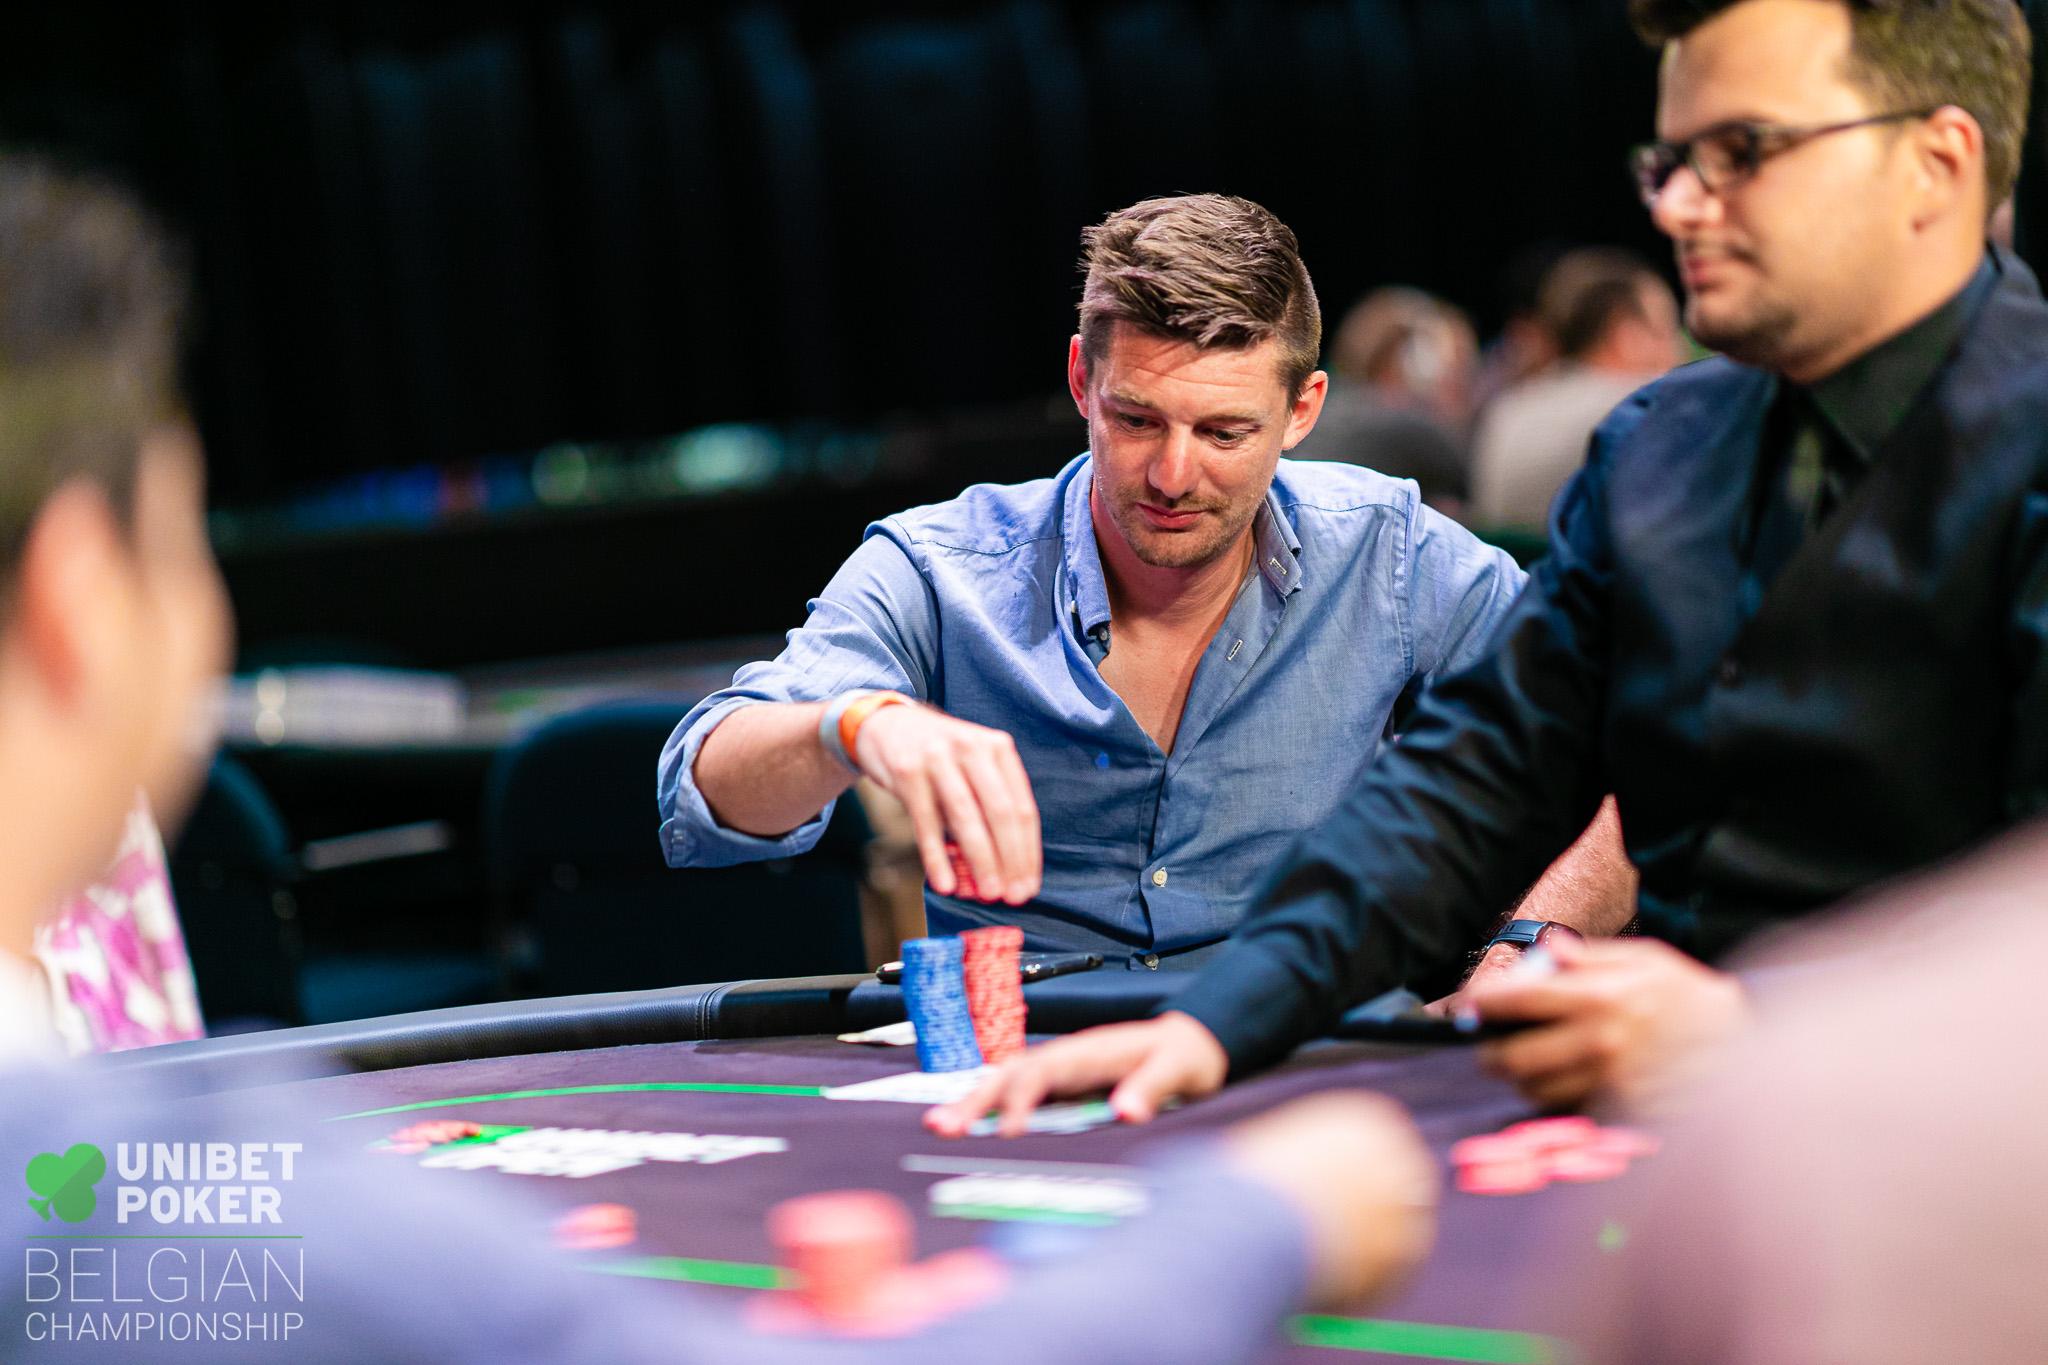 Unibet Poker Belgian Championship 2019 - Main Event (Day 2) 024 Glenn Laureys ((C) Tambet Kask 2019)